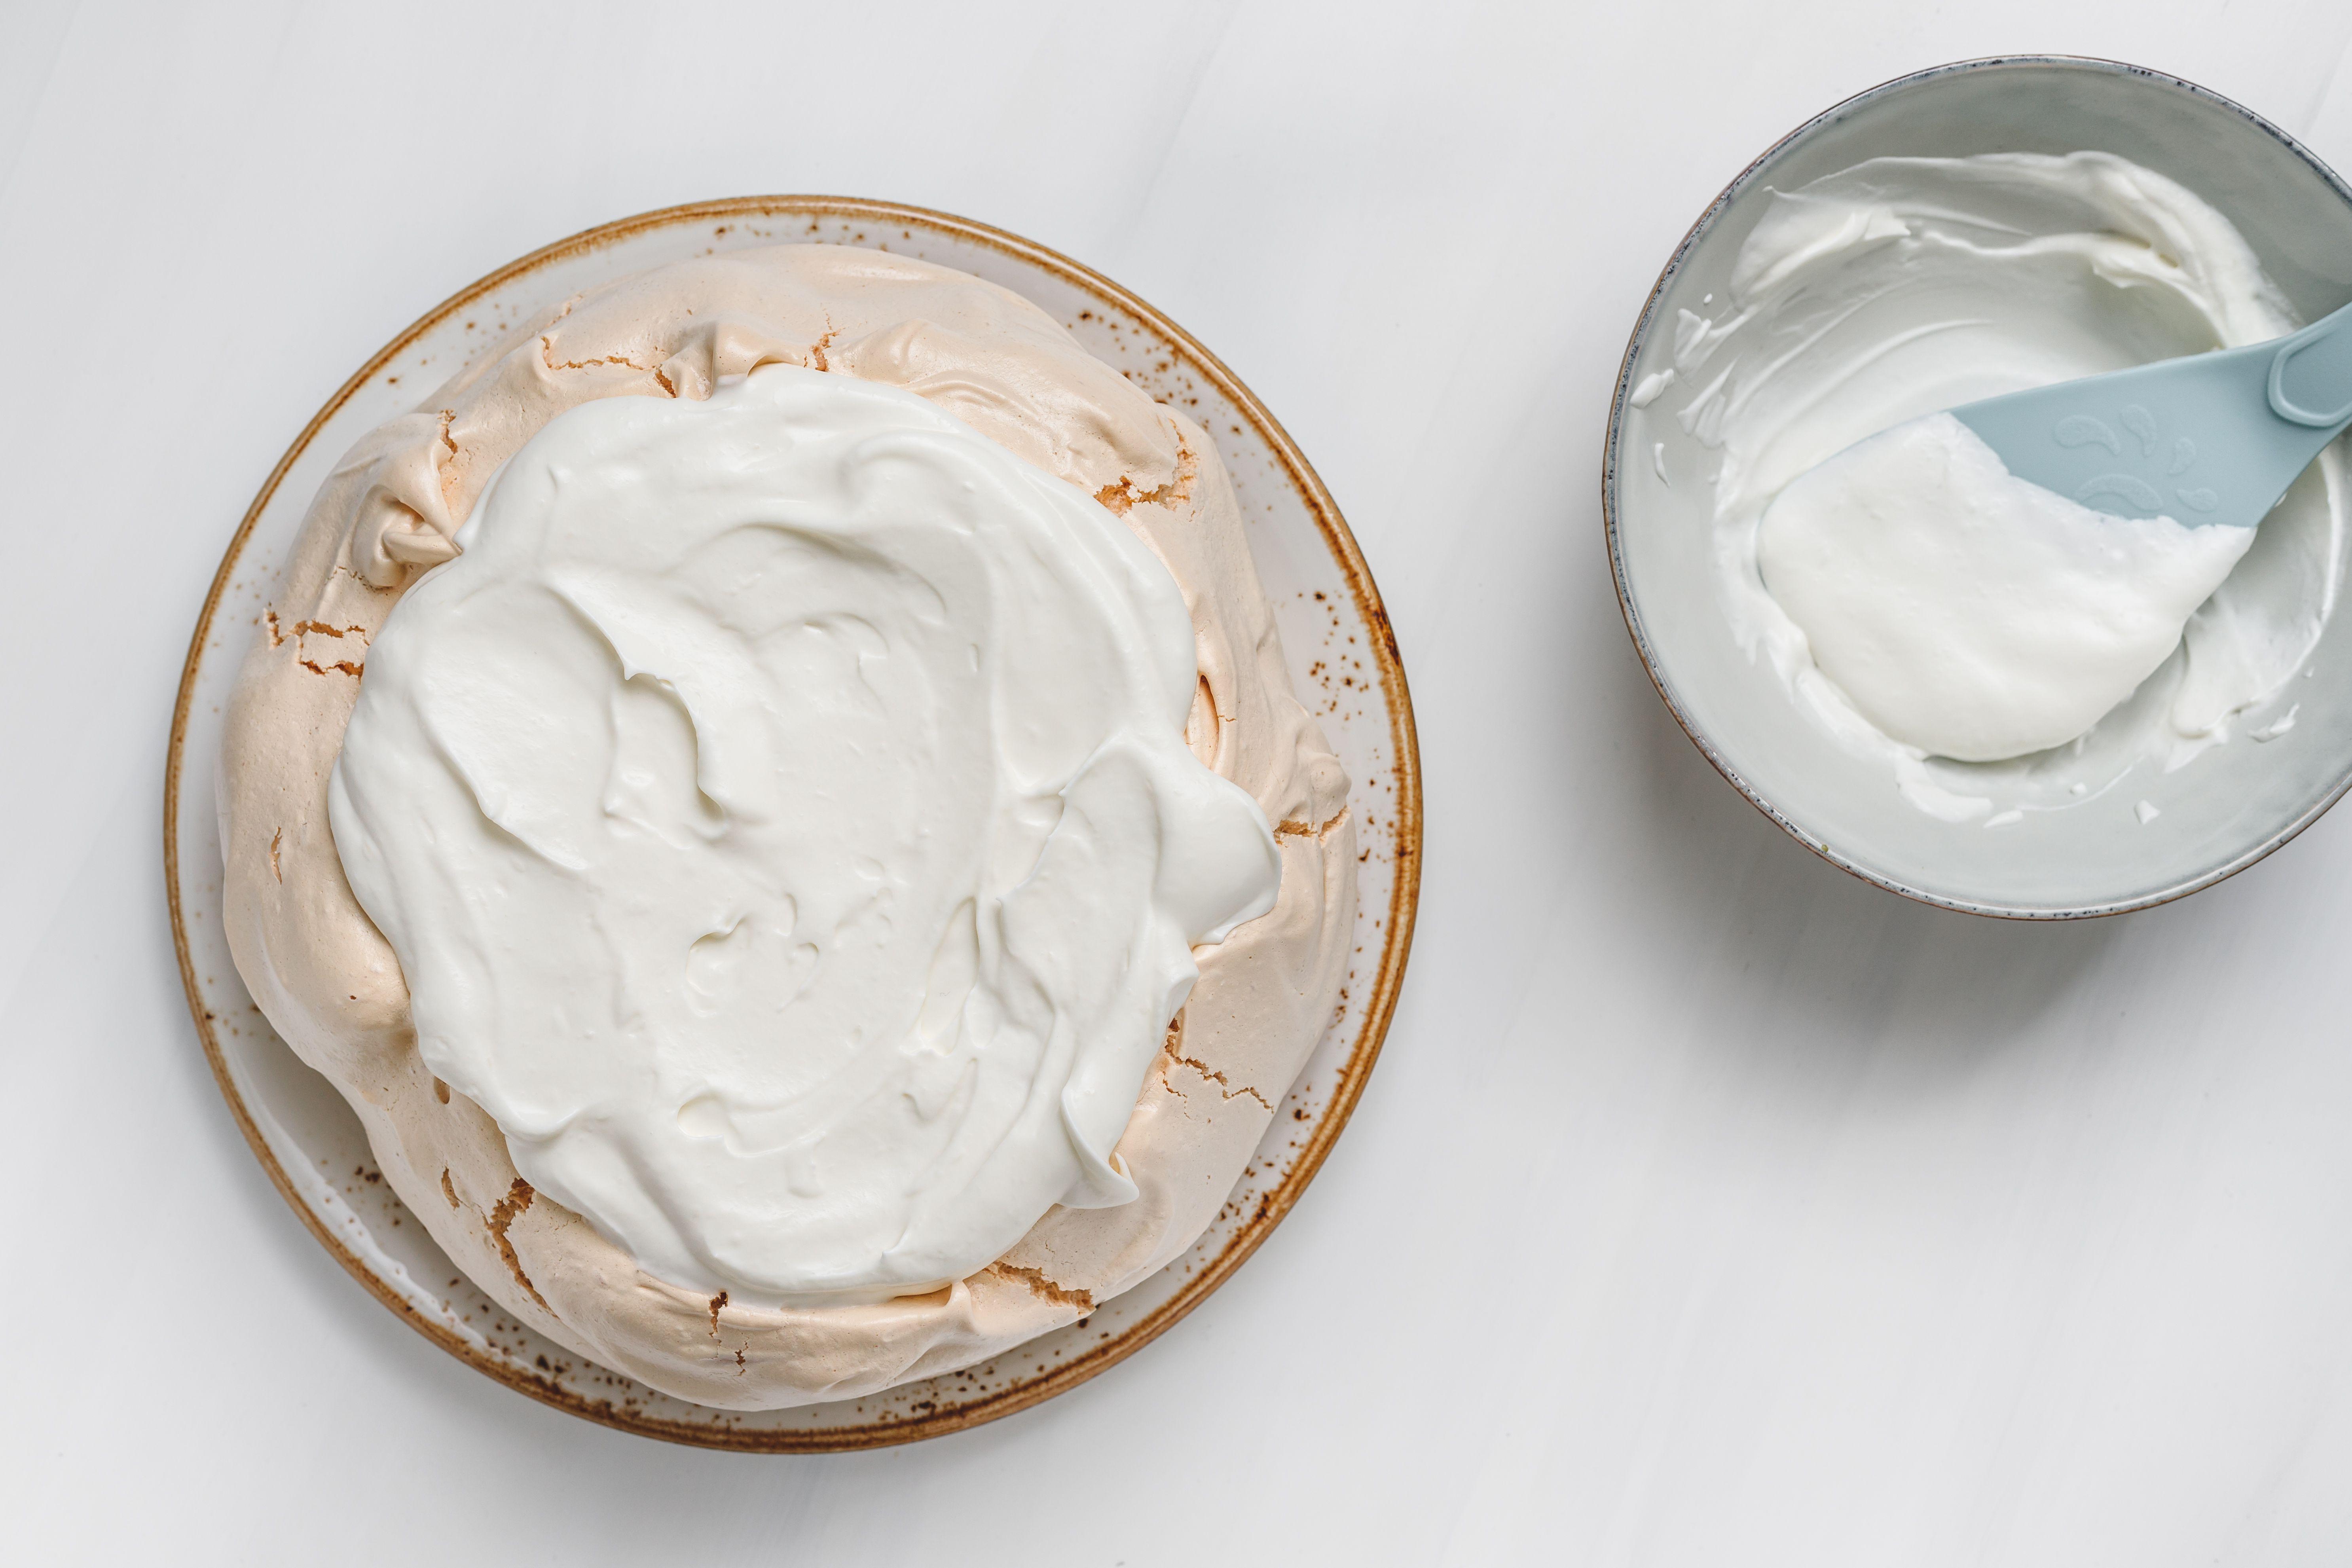 Whipped cream spread over meringue